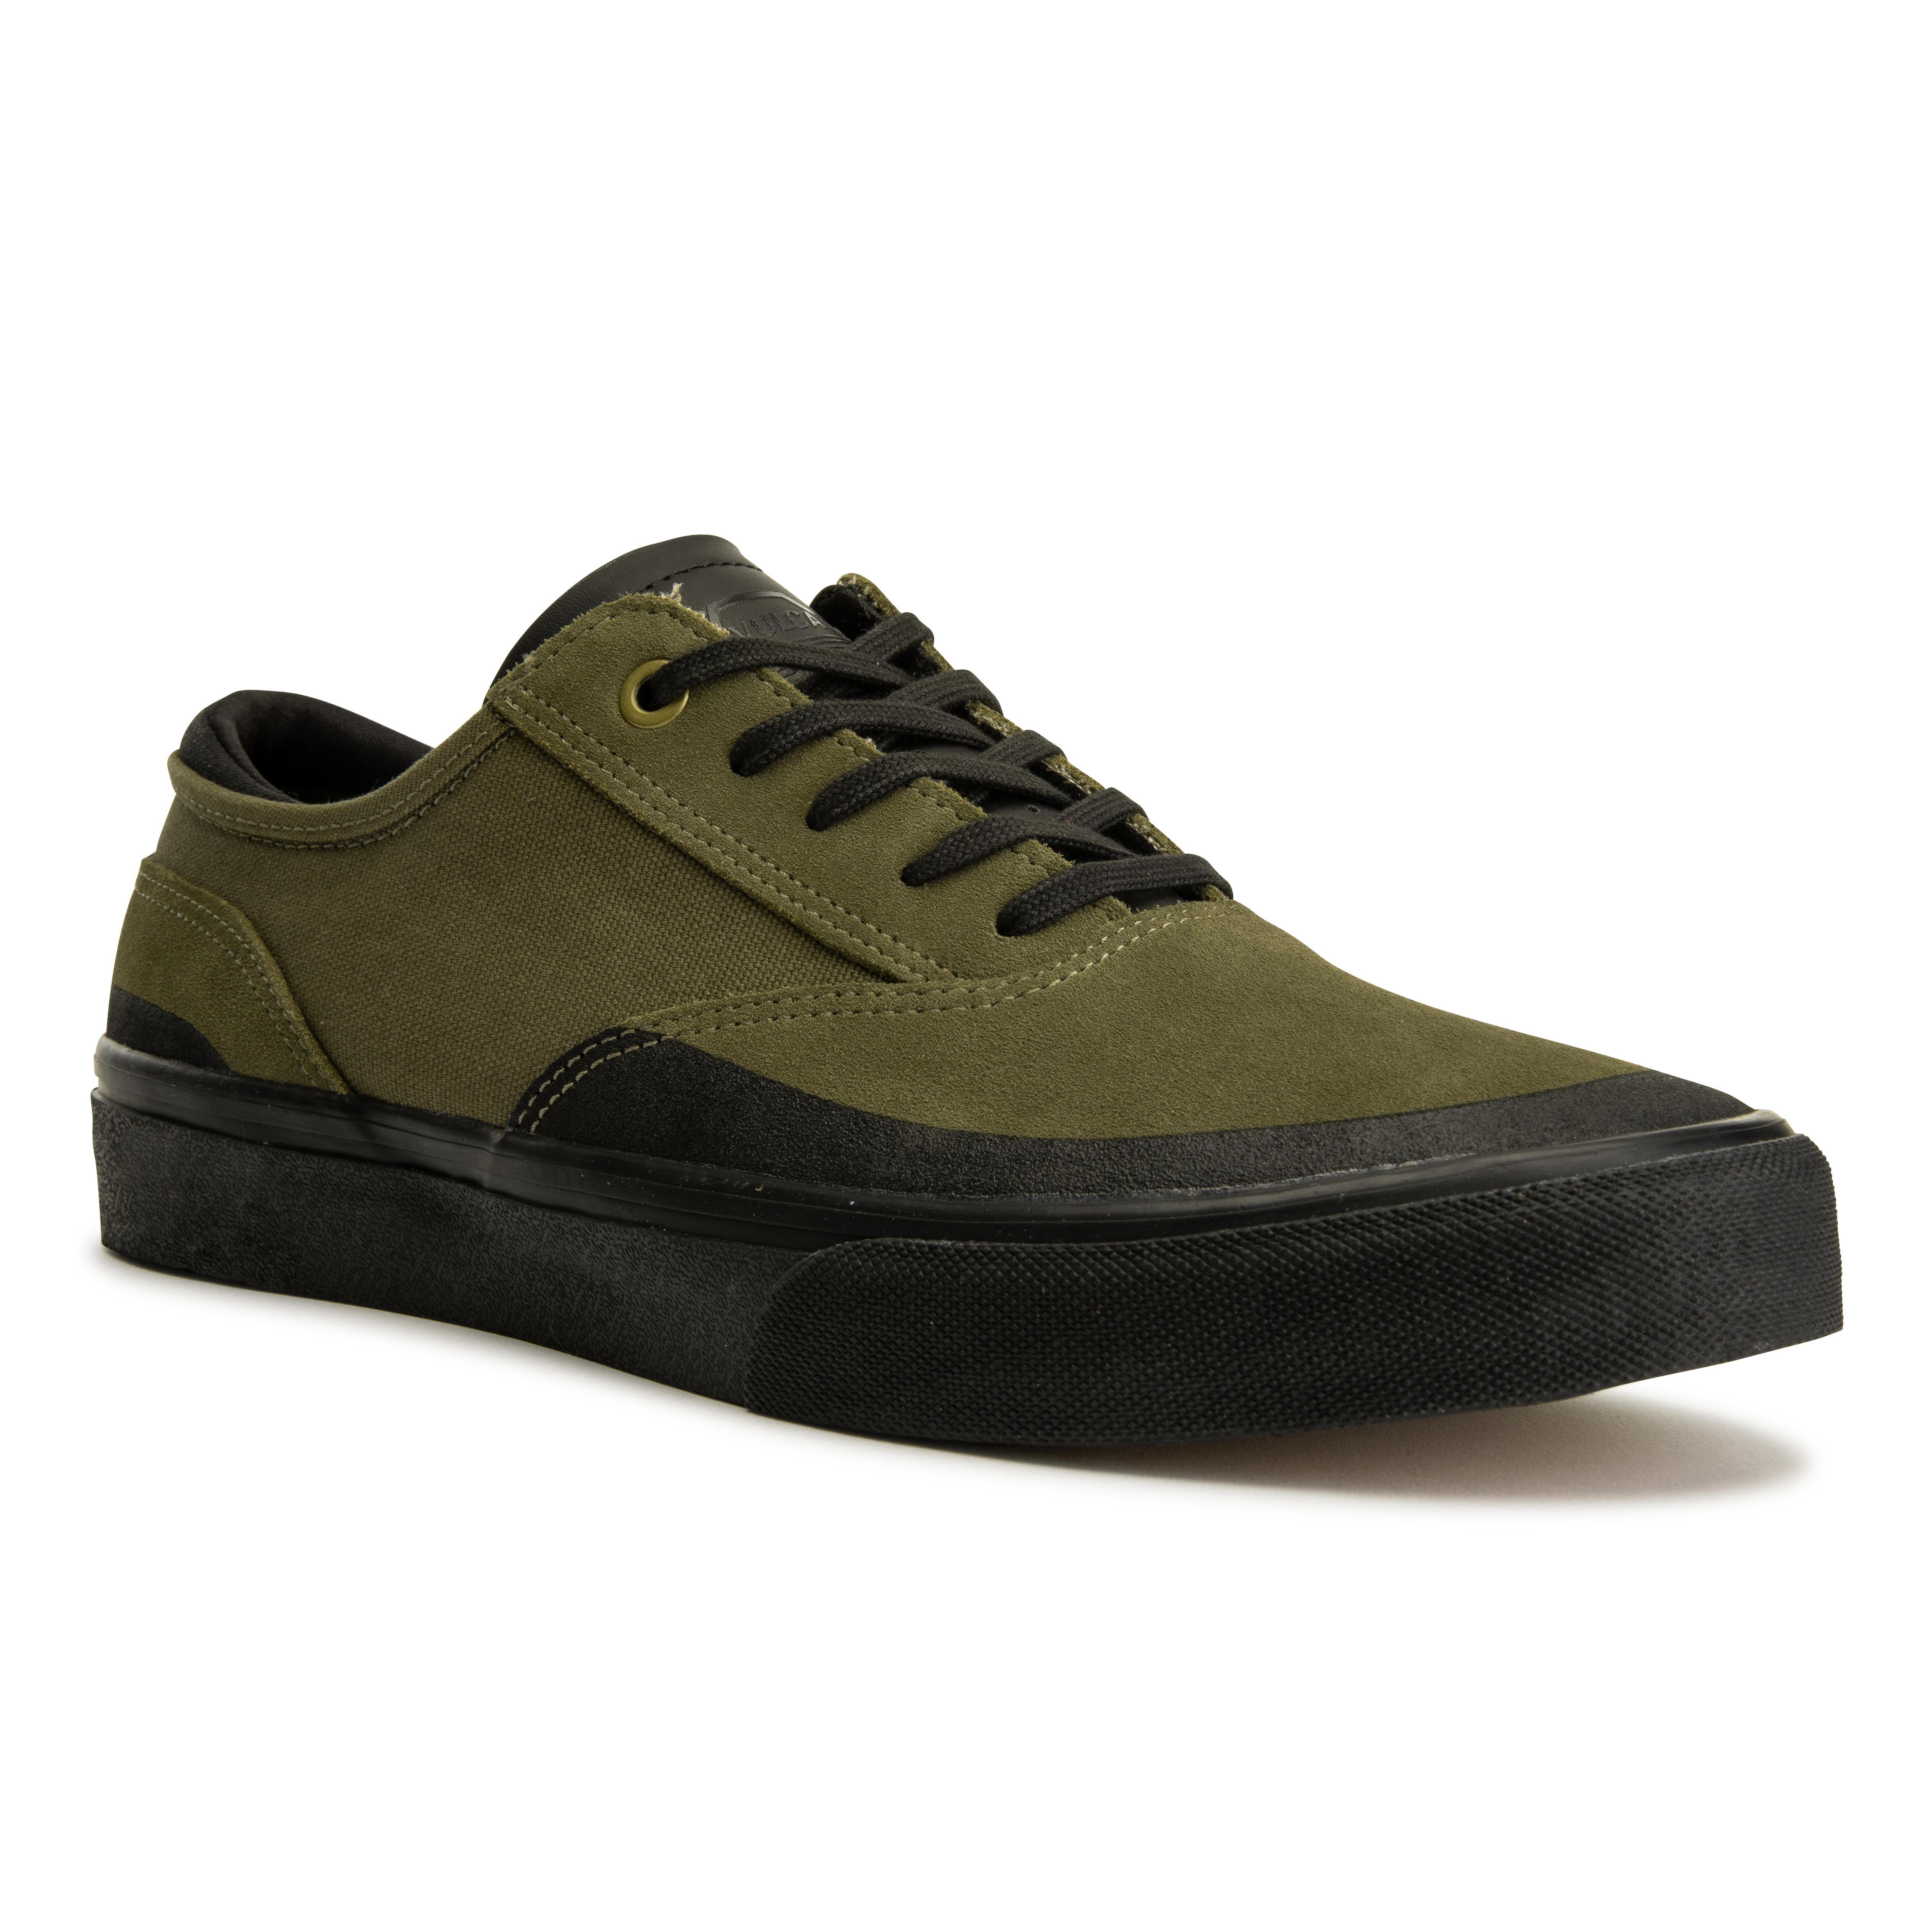 Oxelo Chaussures basses de skateboard adulte VULCA 500 Kaki, semelle noire - Oxelo